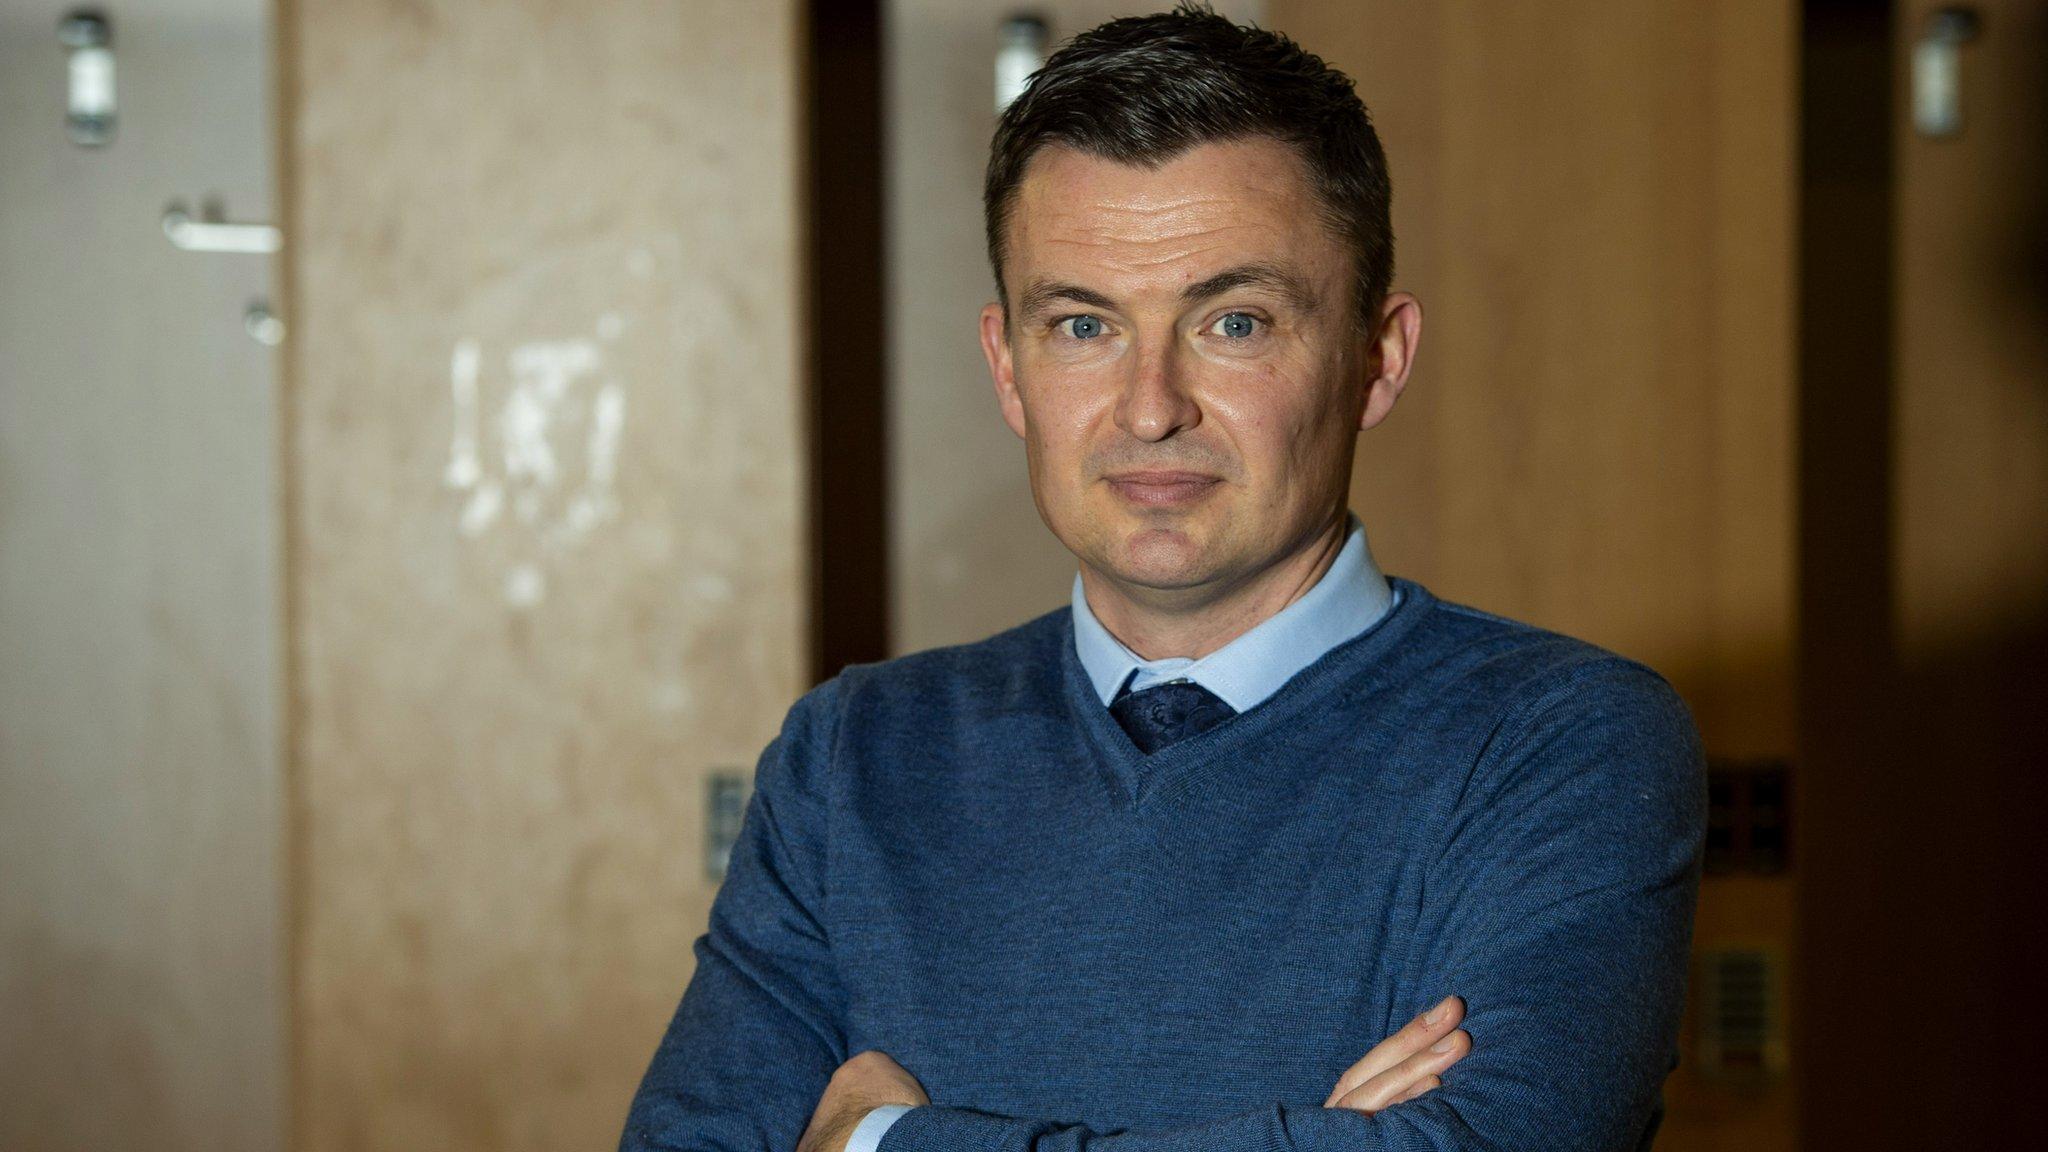 Hibernian: Paul Heckingbottom appointed as head coach